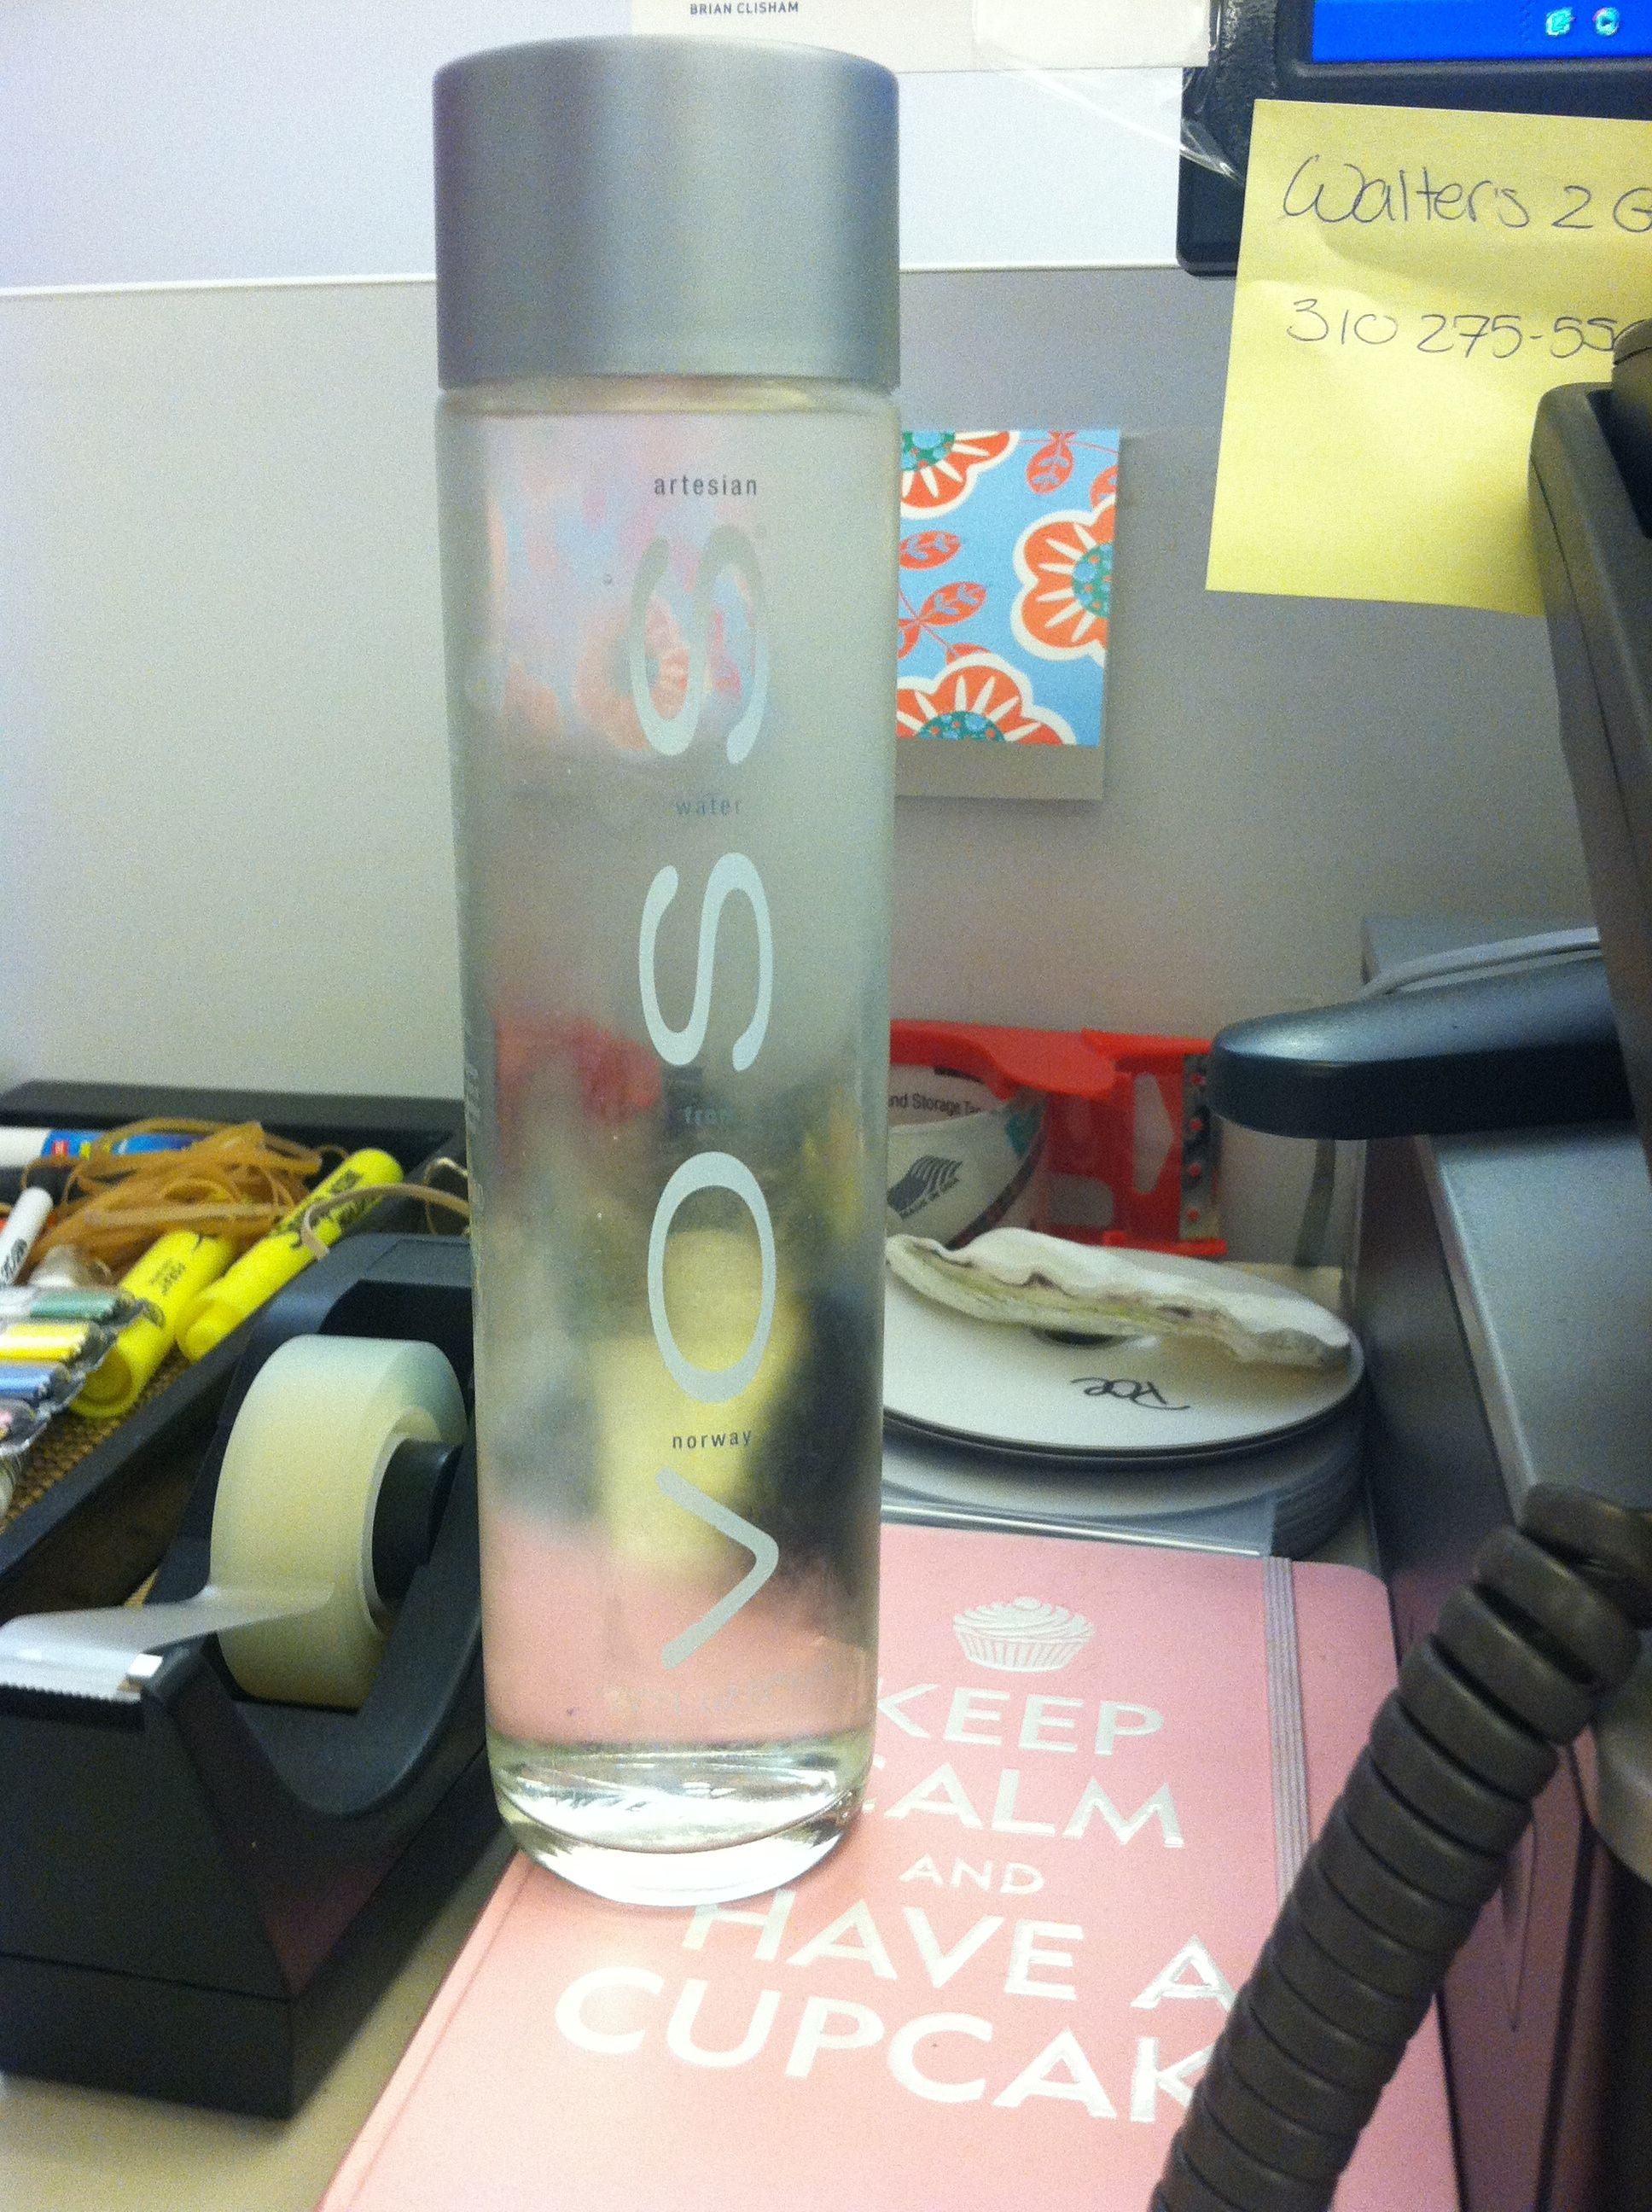 small pleasures pretentious water bottles voss is ßoss